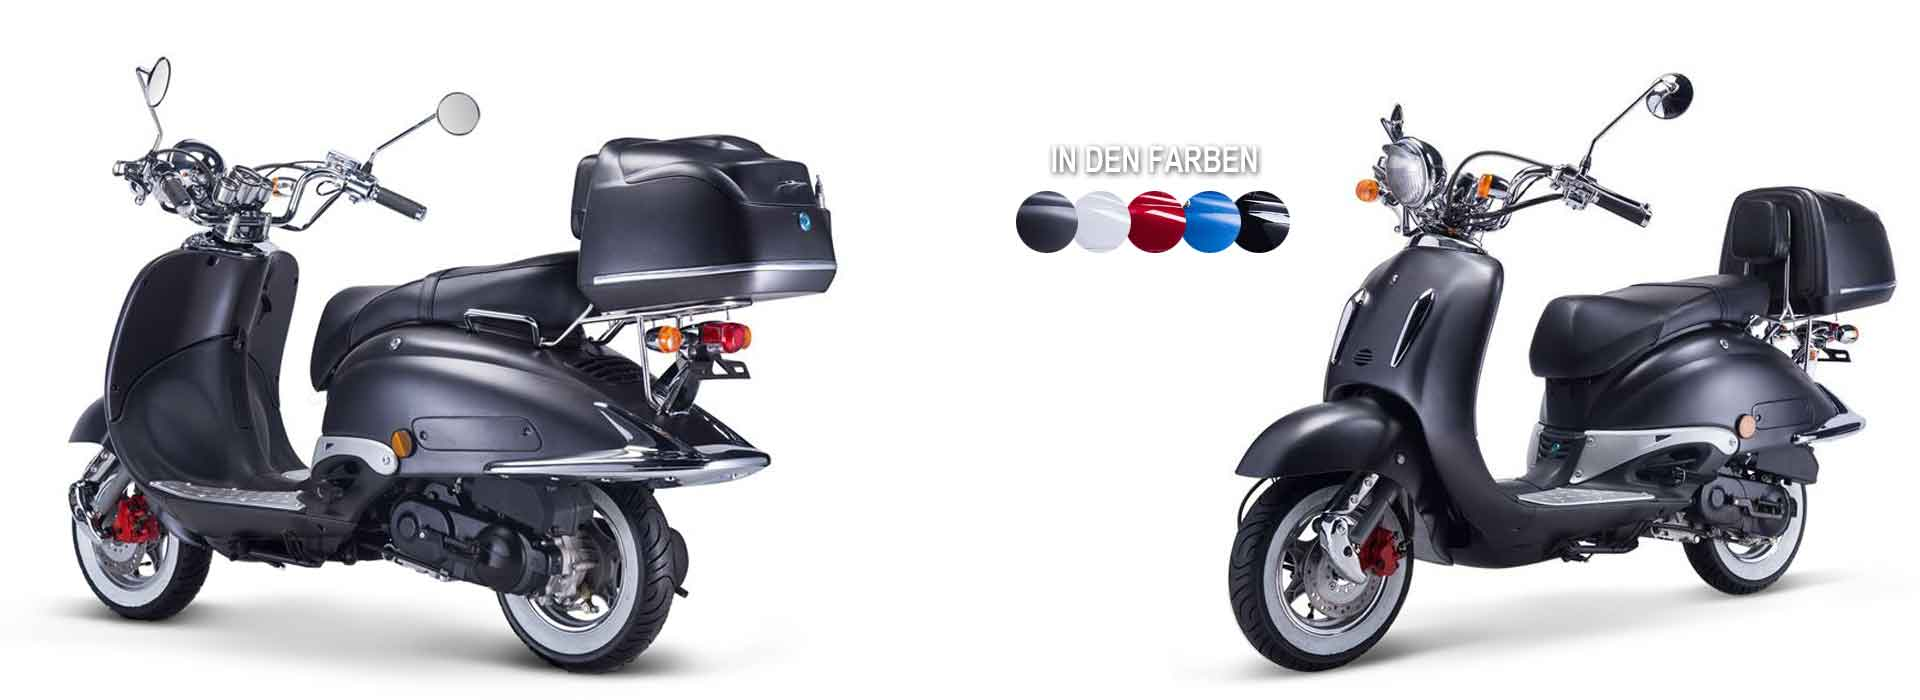 trike 50ccm kaufen best rolektro blau with trike 50ccm. Black Bedroom Furniture Sets. Home Design Ideas